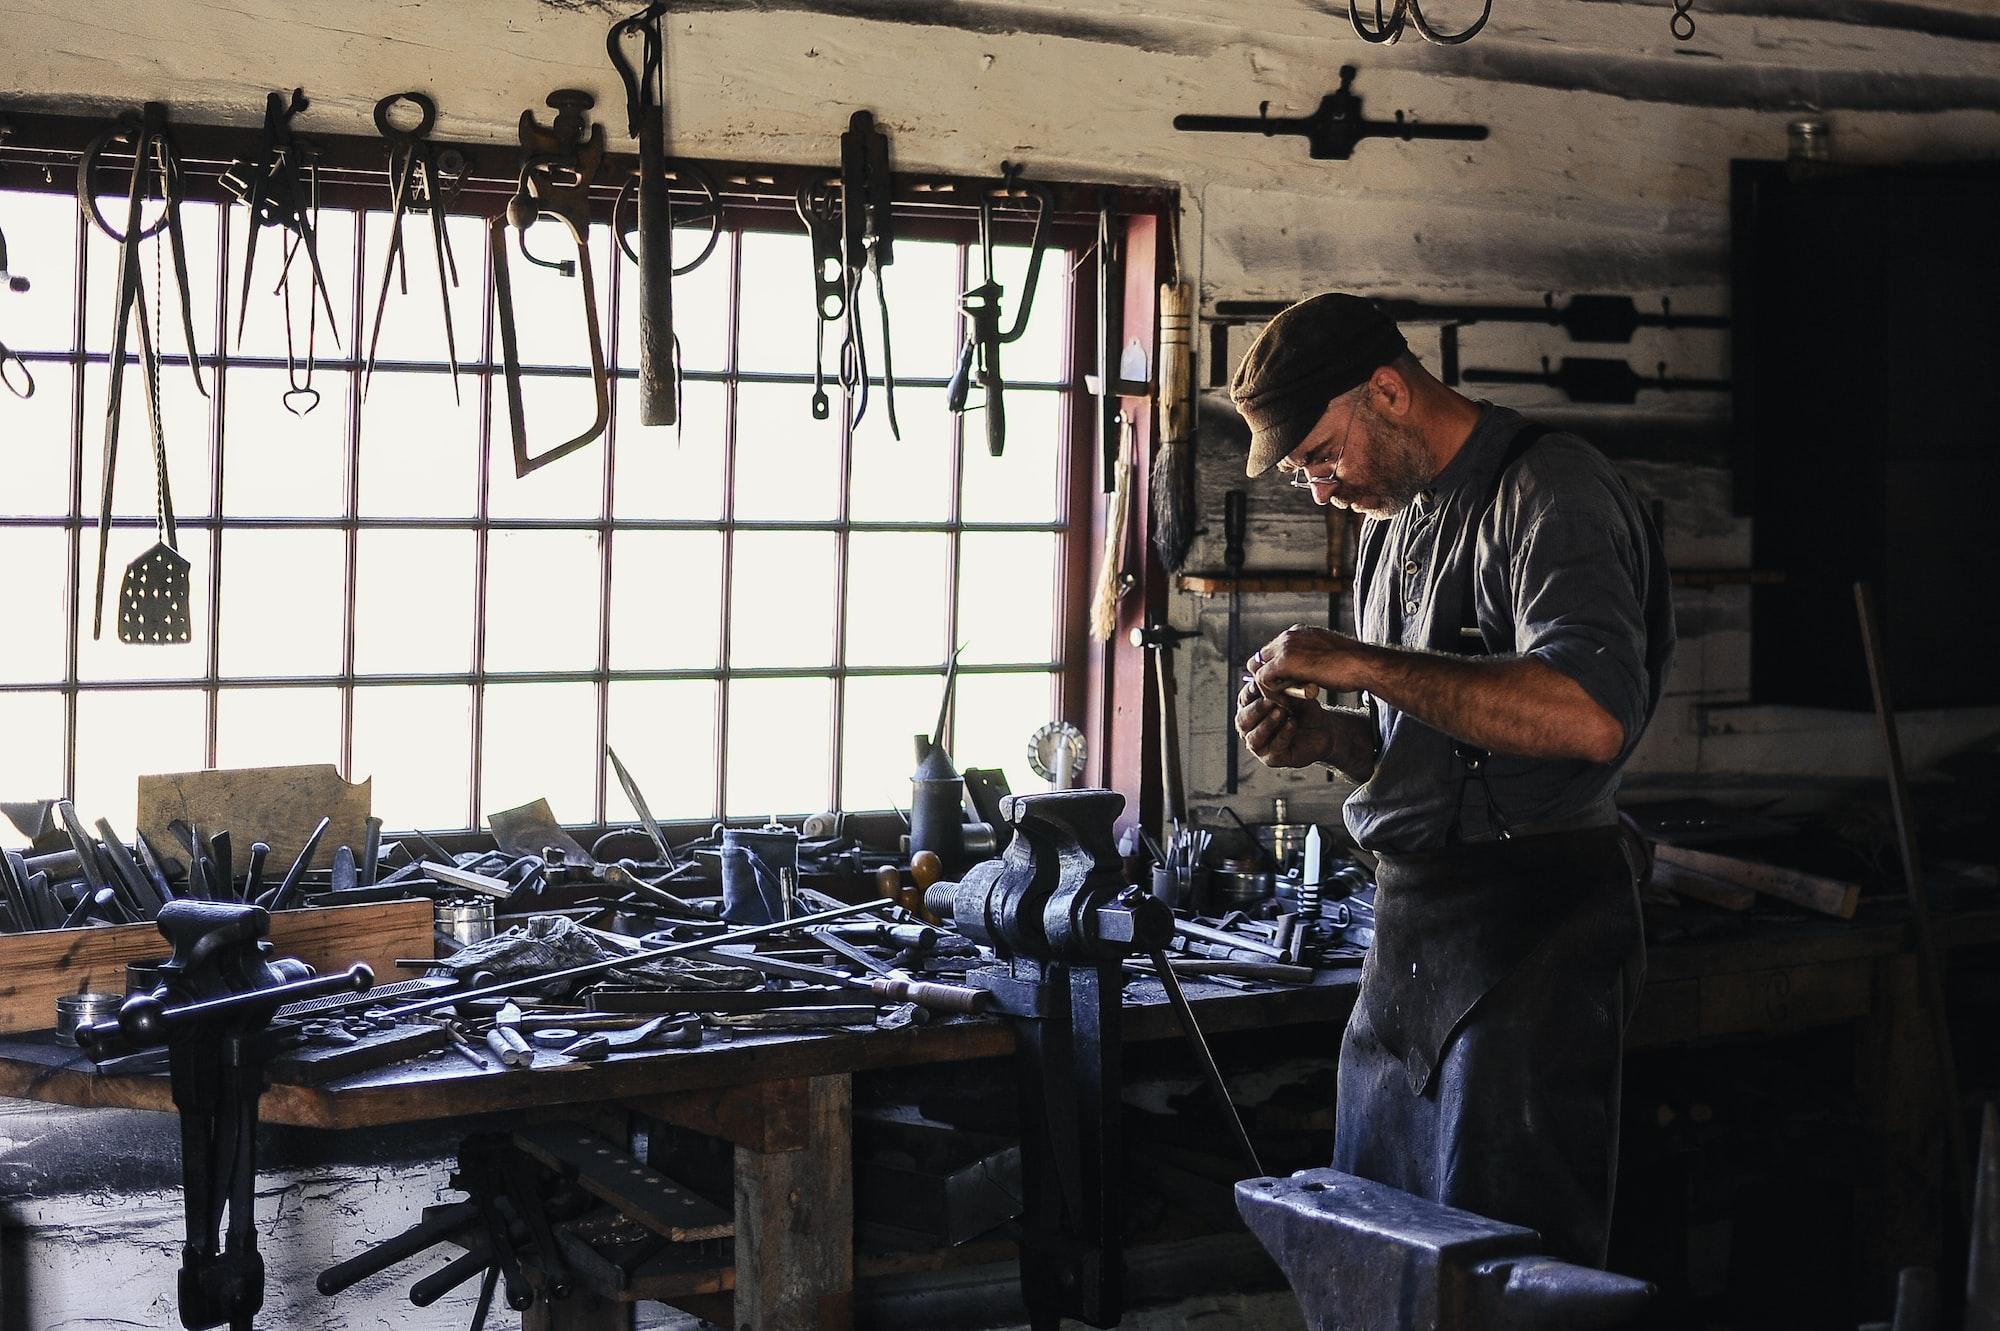 Busy craftsman